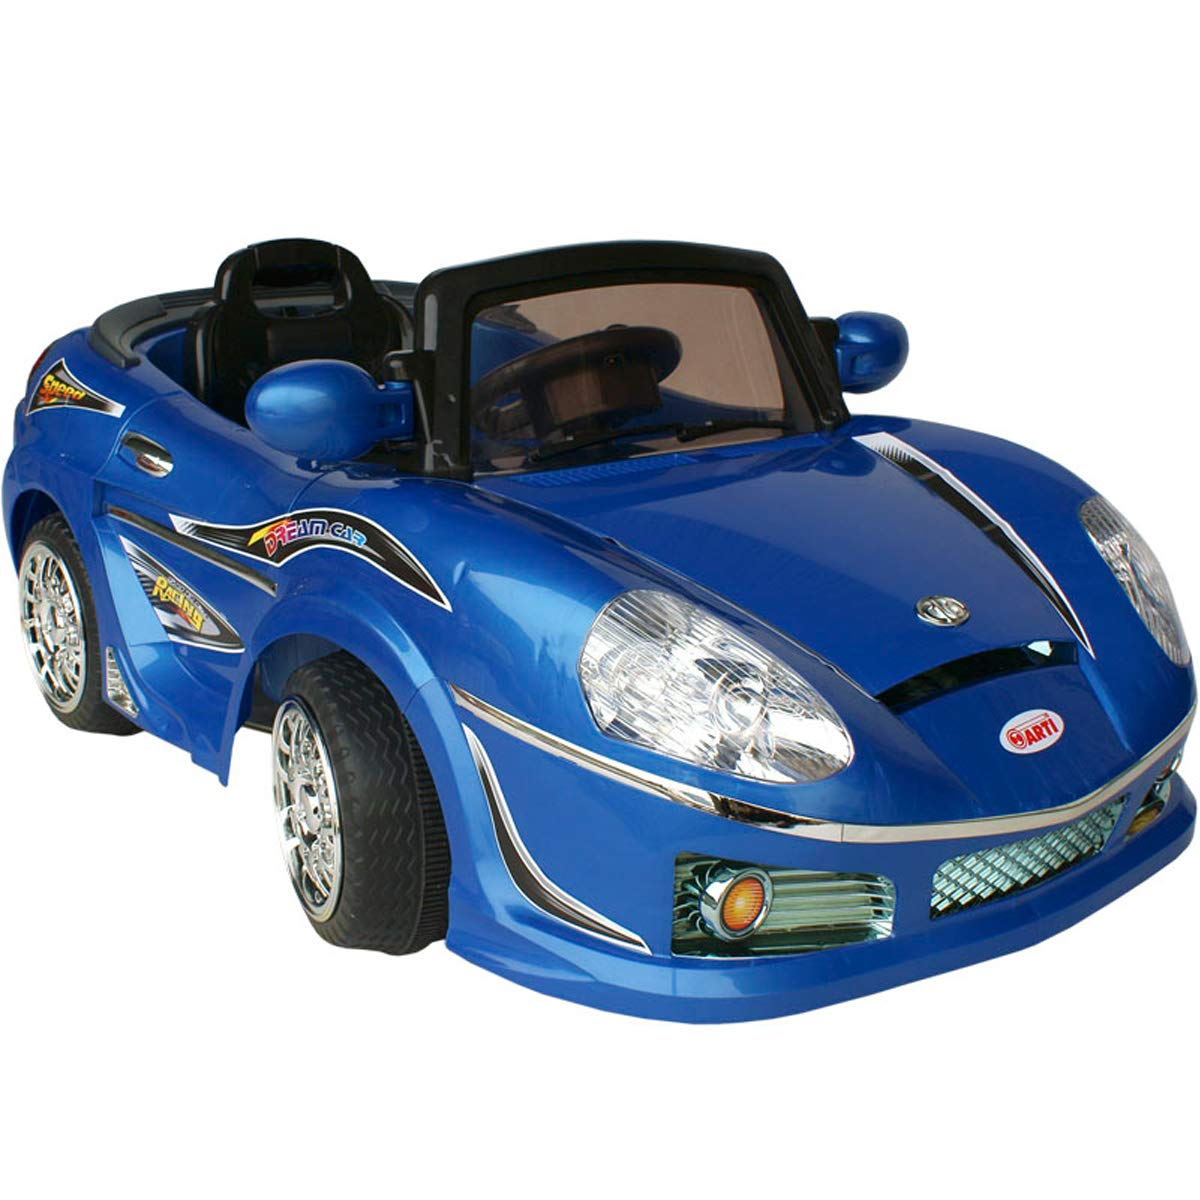 Scalesport 698R Roadster Elektrofahrzeug Sportwagen Spielzeugauto Elektrisches Kinderfahrzeug Kinder Spielzeug (Blau (698R/Blau))